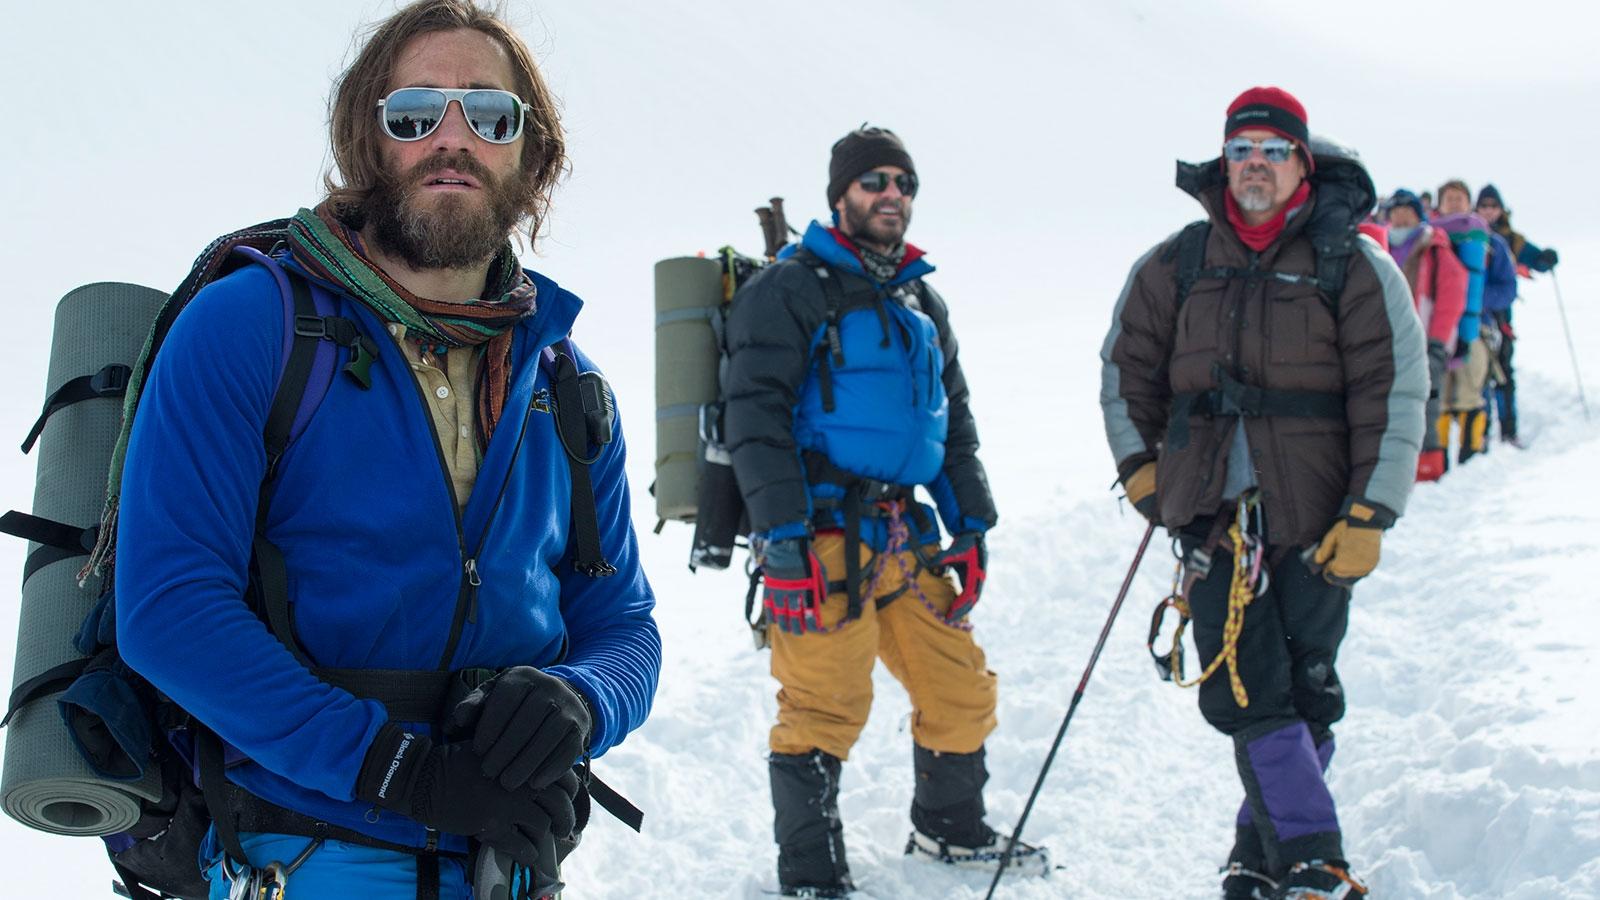 film,everest,cinéma,aventure,expédition,montagne,baltasar kormákur,jon krakauer,tragédie à l'everest